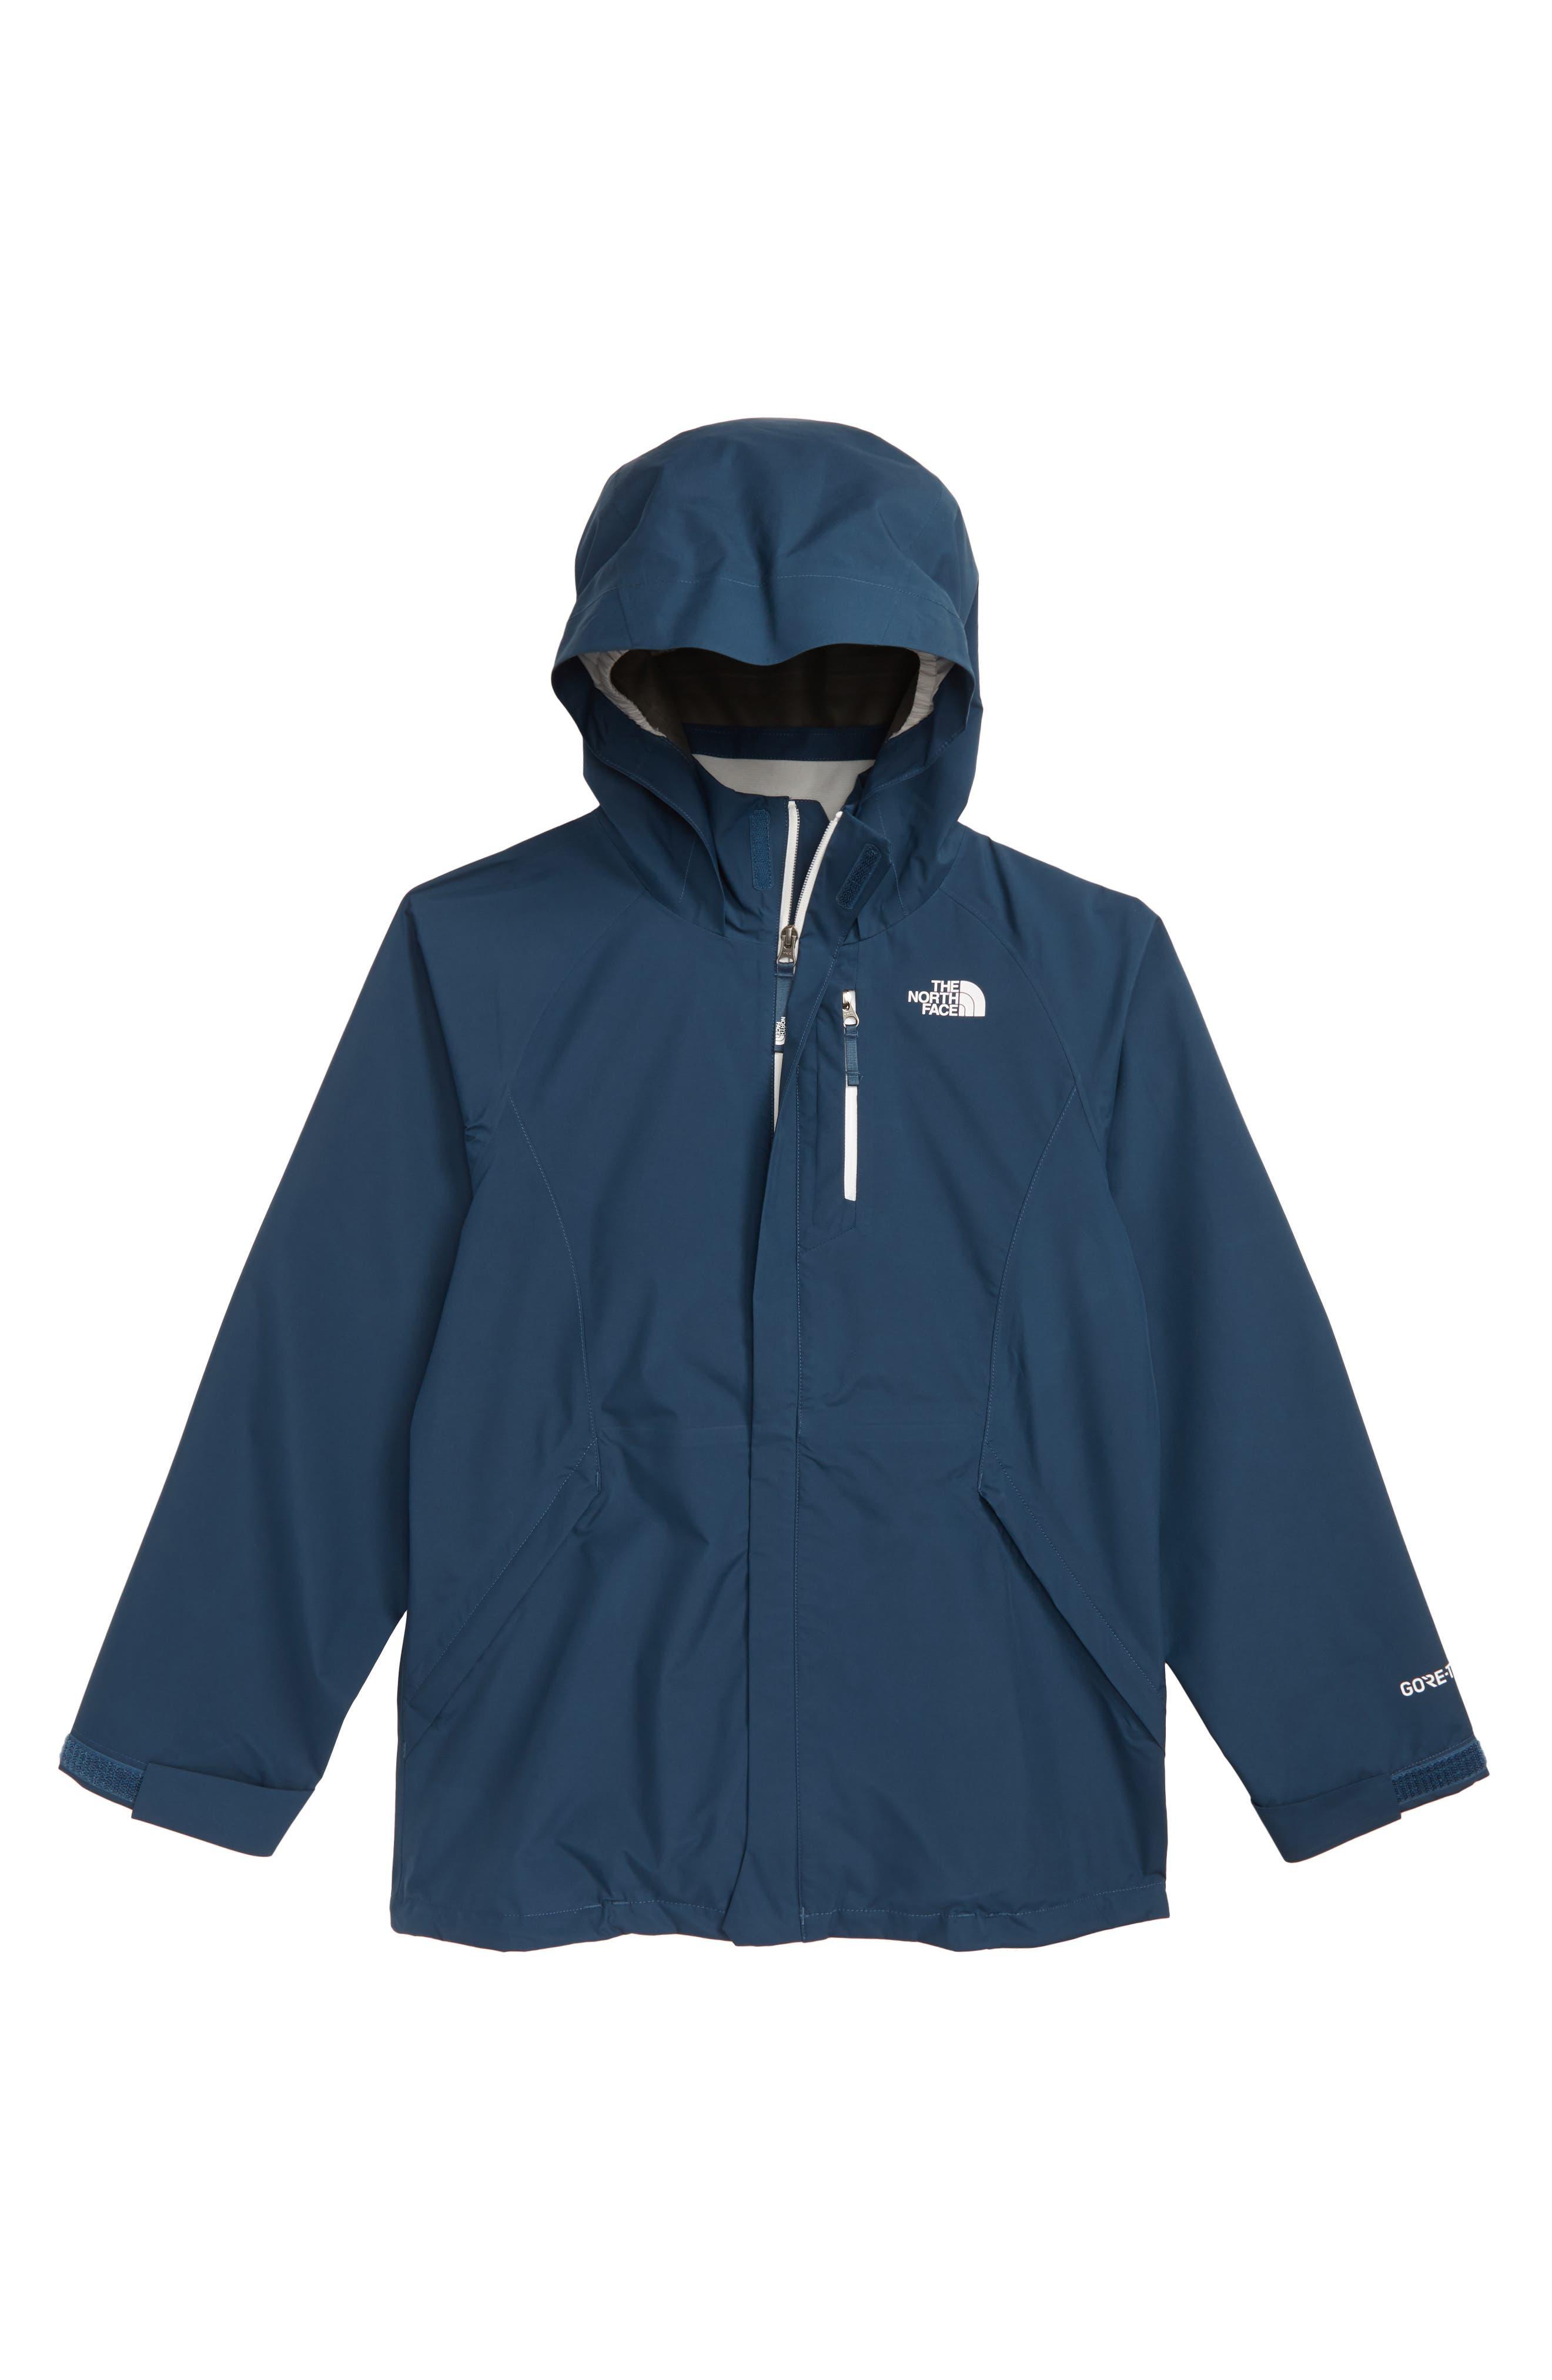 Dryzzle Waterproof Jacket,                             Main thumbnail 1, color,